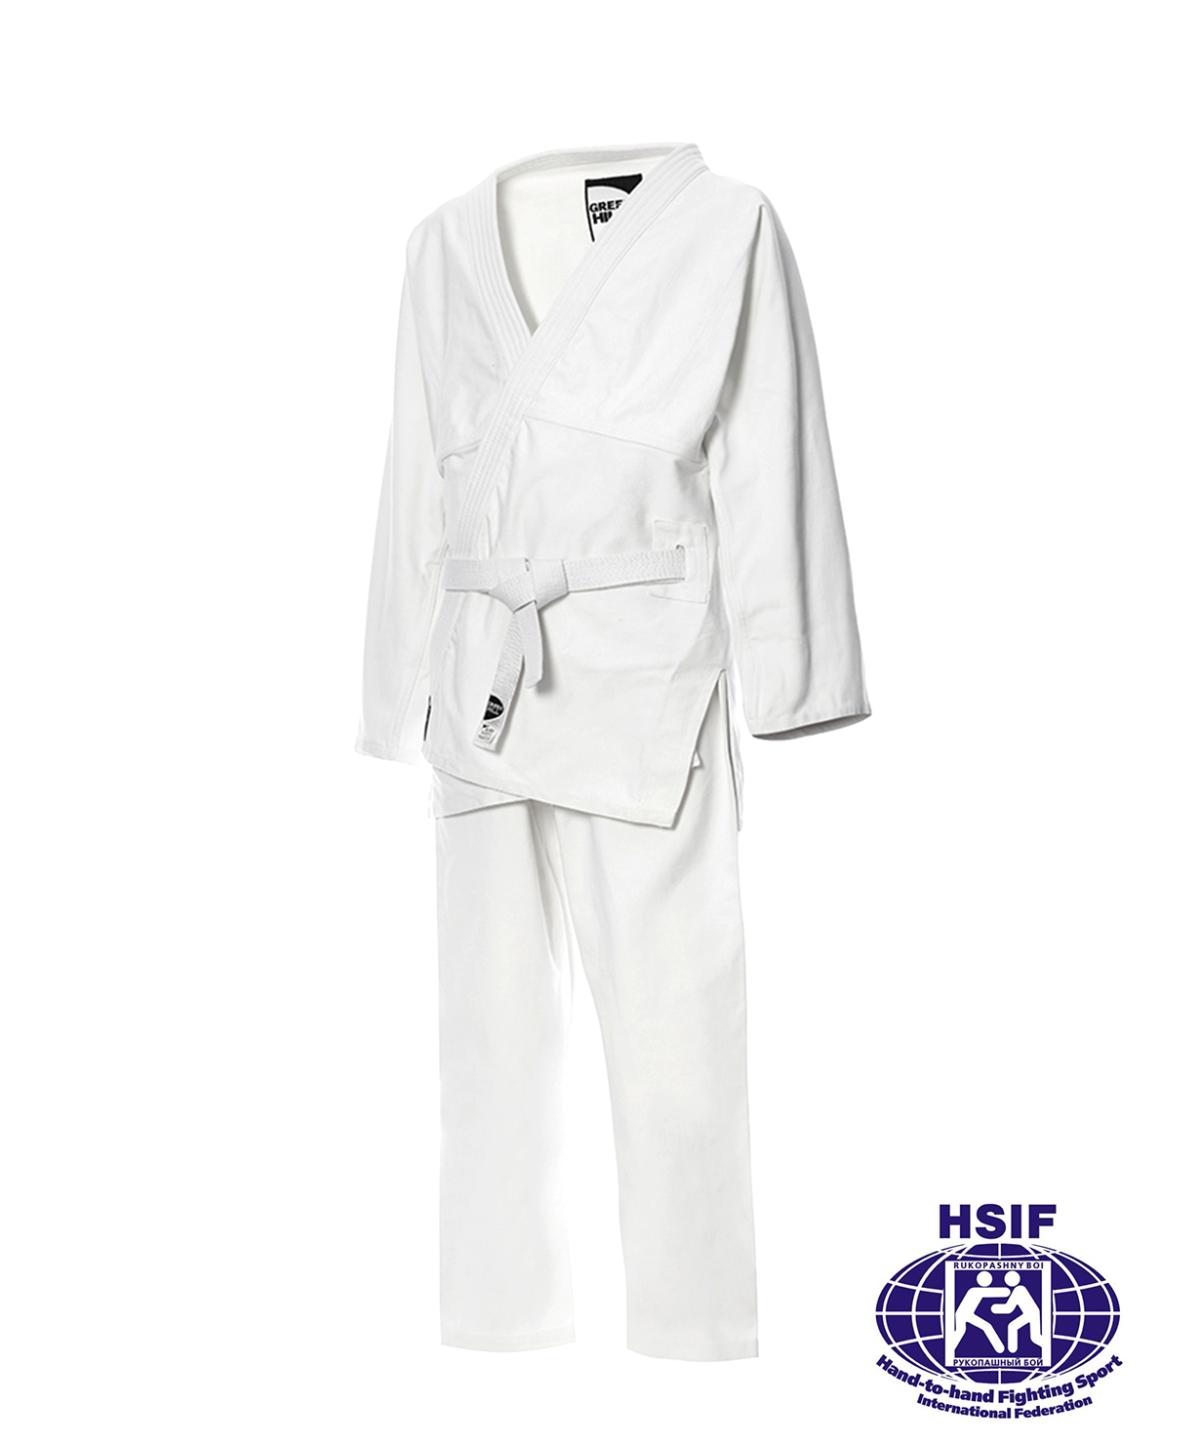 GREEN HILL Кимоно для рукопашного боя р.4/170 Junior  SHH-2210 - 1